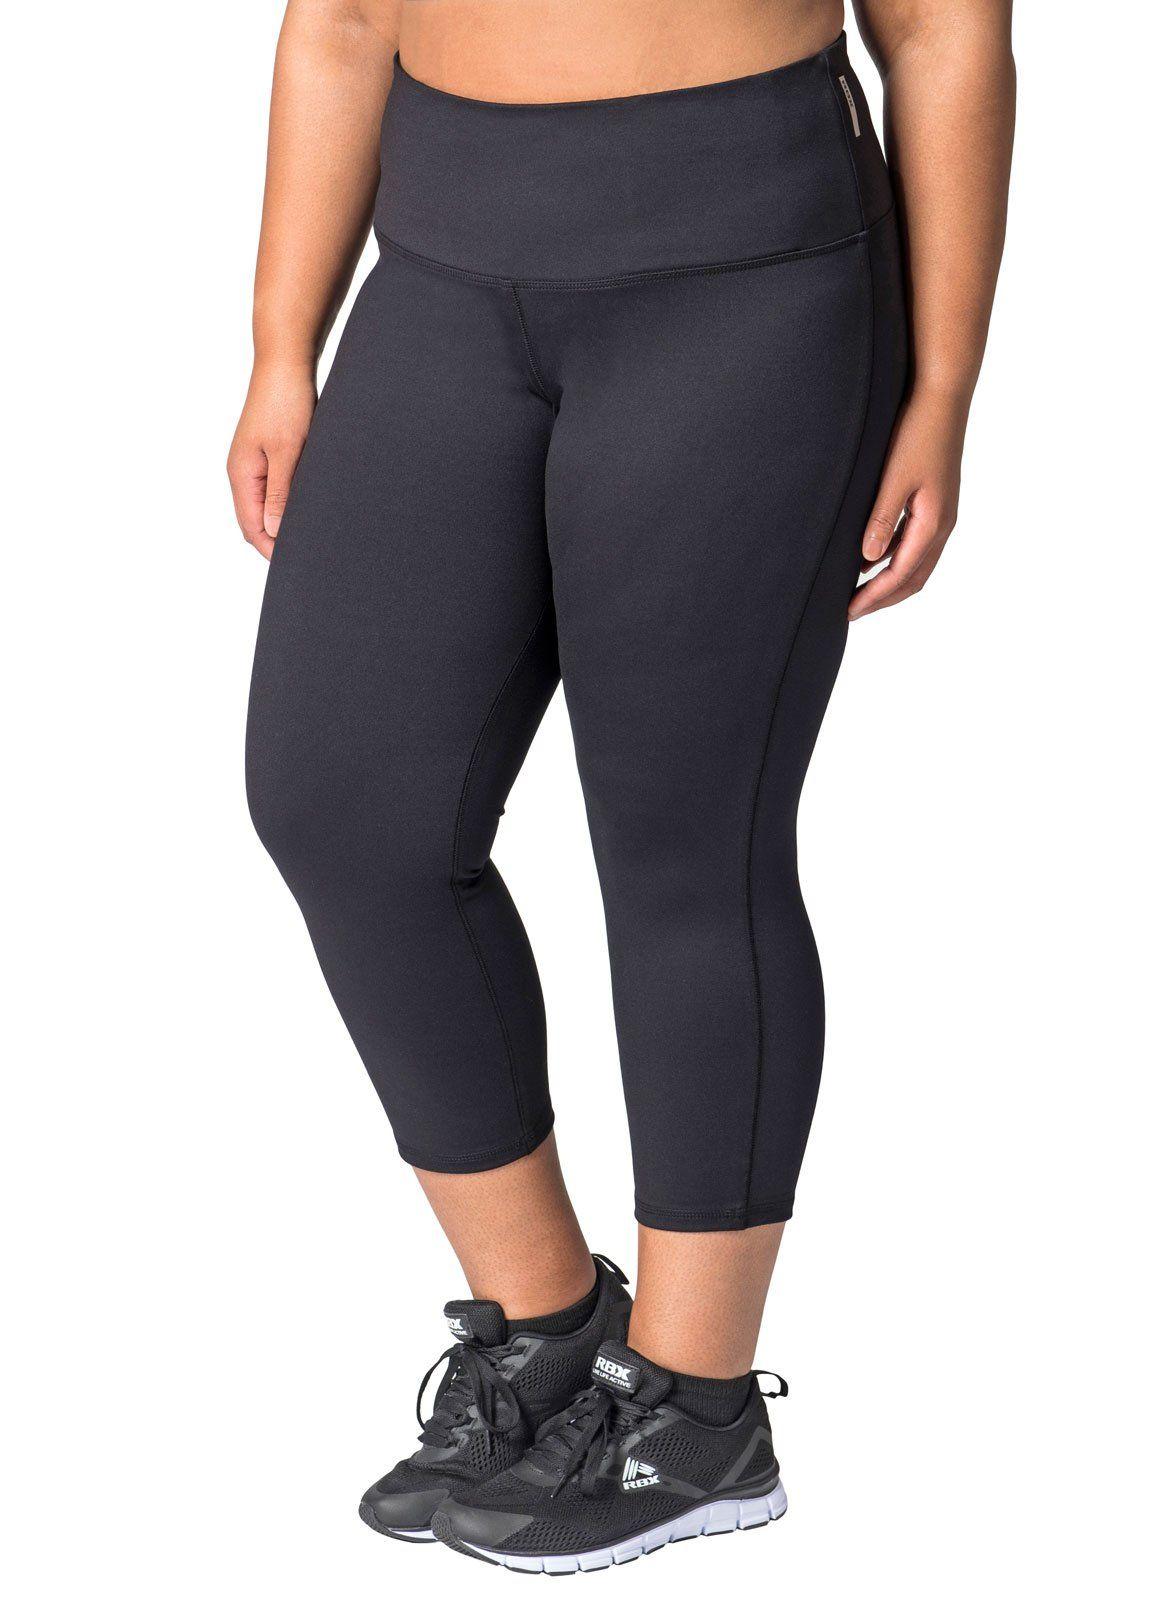 226b45e1dda RBX Active Women s Plus Size Workout Yoga Leggings Black 2X. X-Dri moisture  wicking